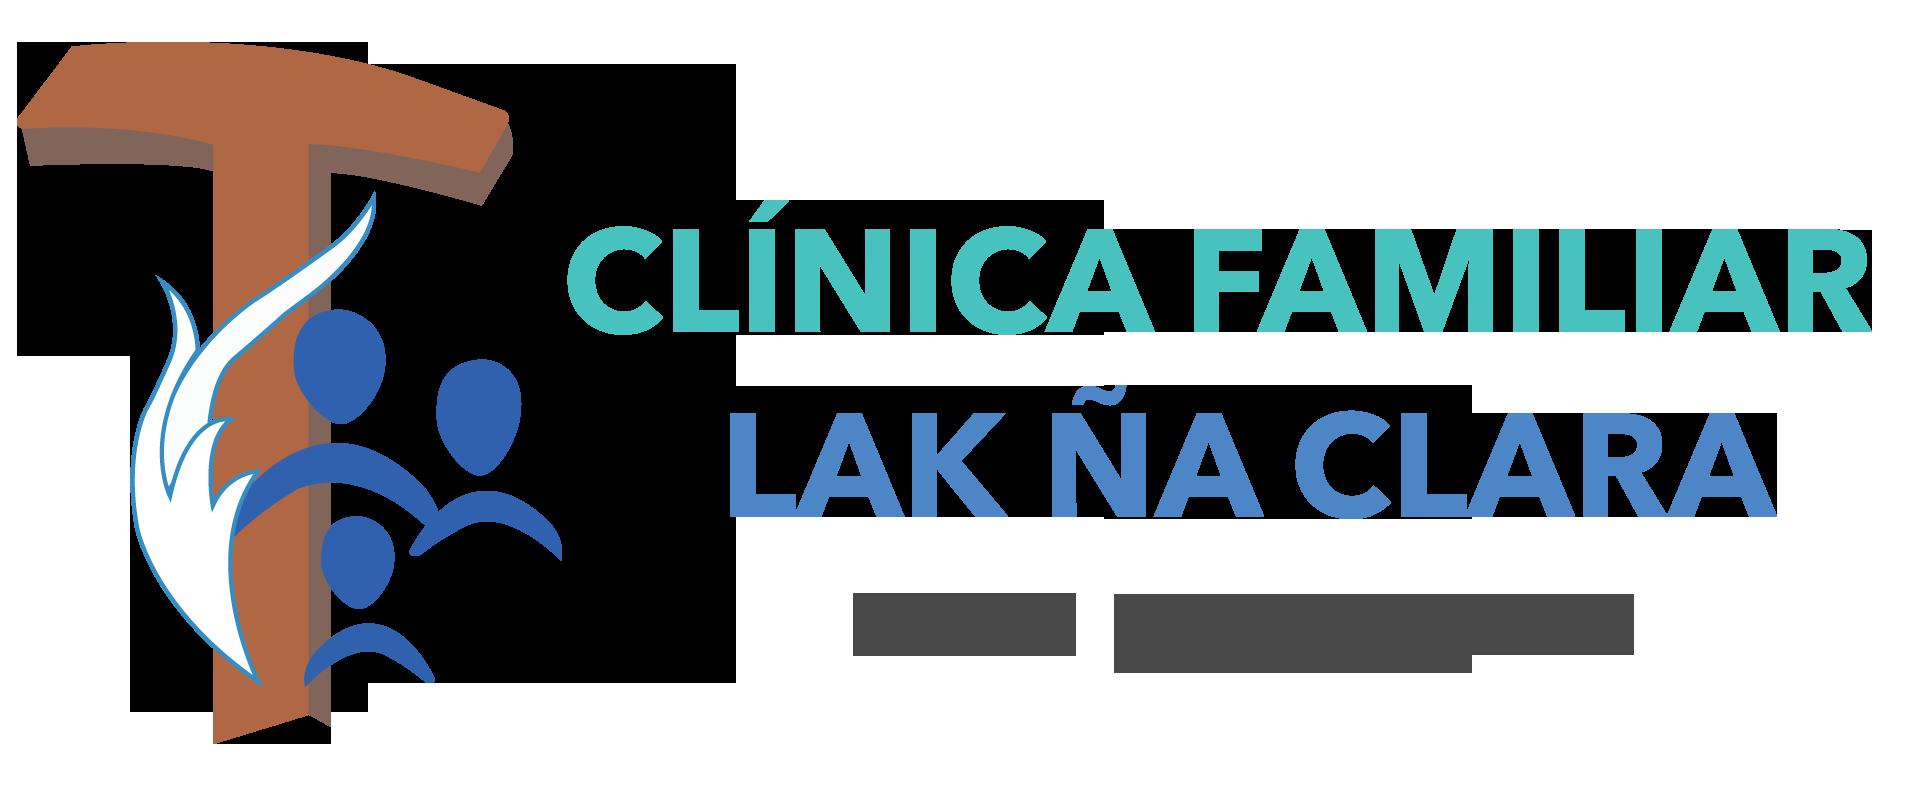 Clinica Familiar Clara